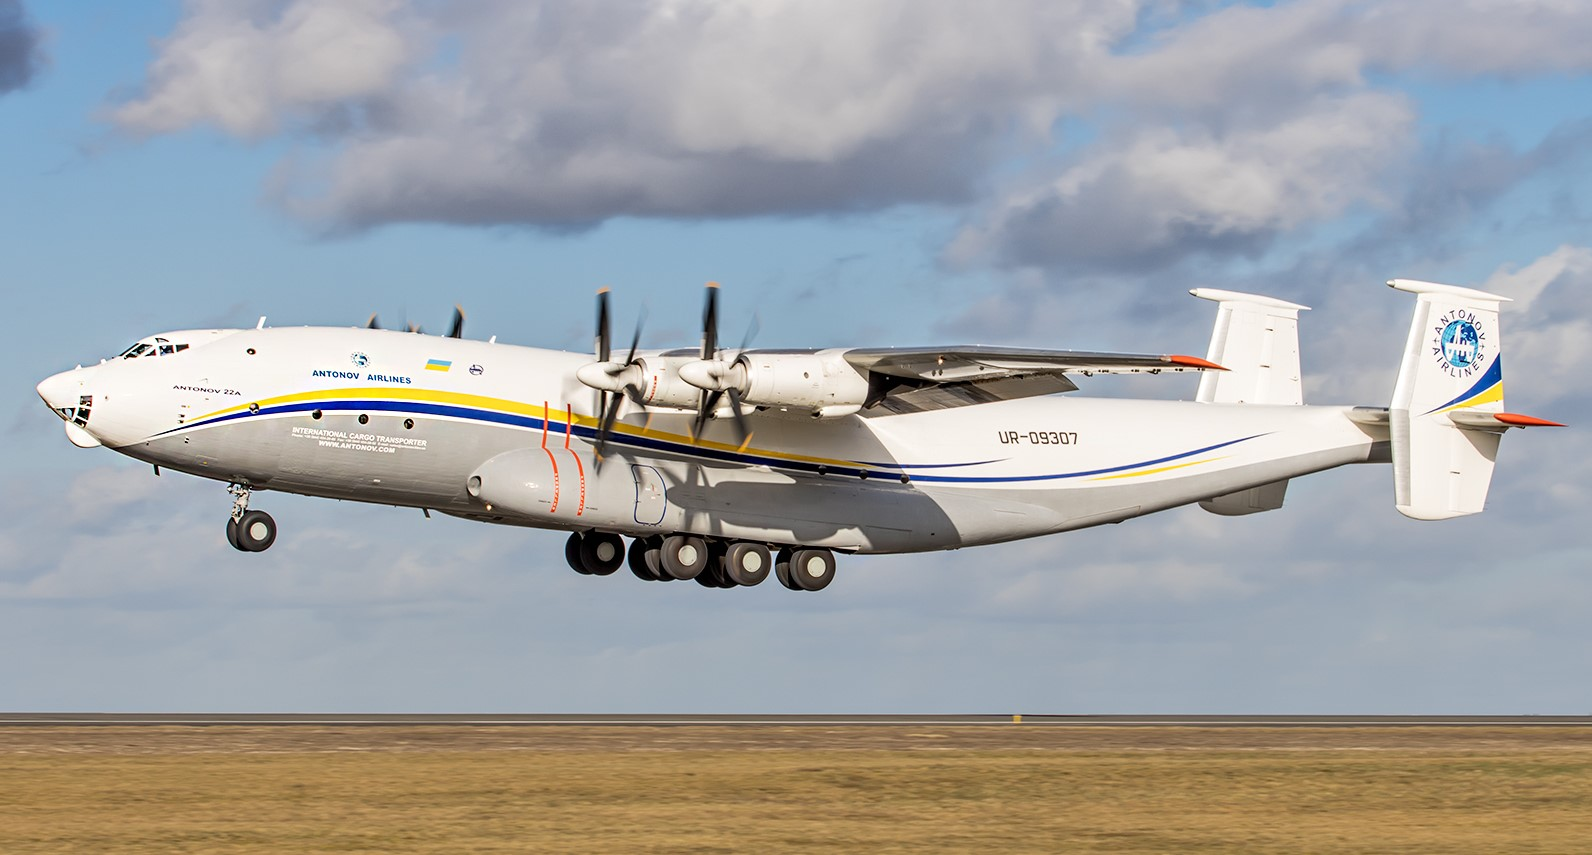 Украинский Ан-22 доставил до 60 тонн груза в Баку для иностранного заказ...